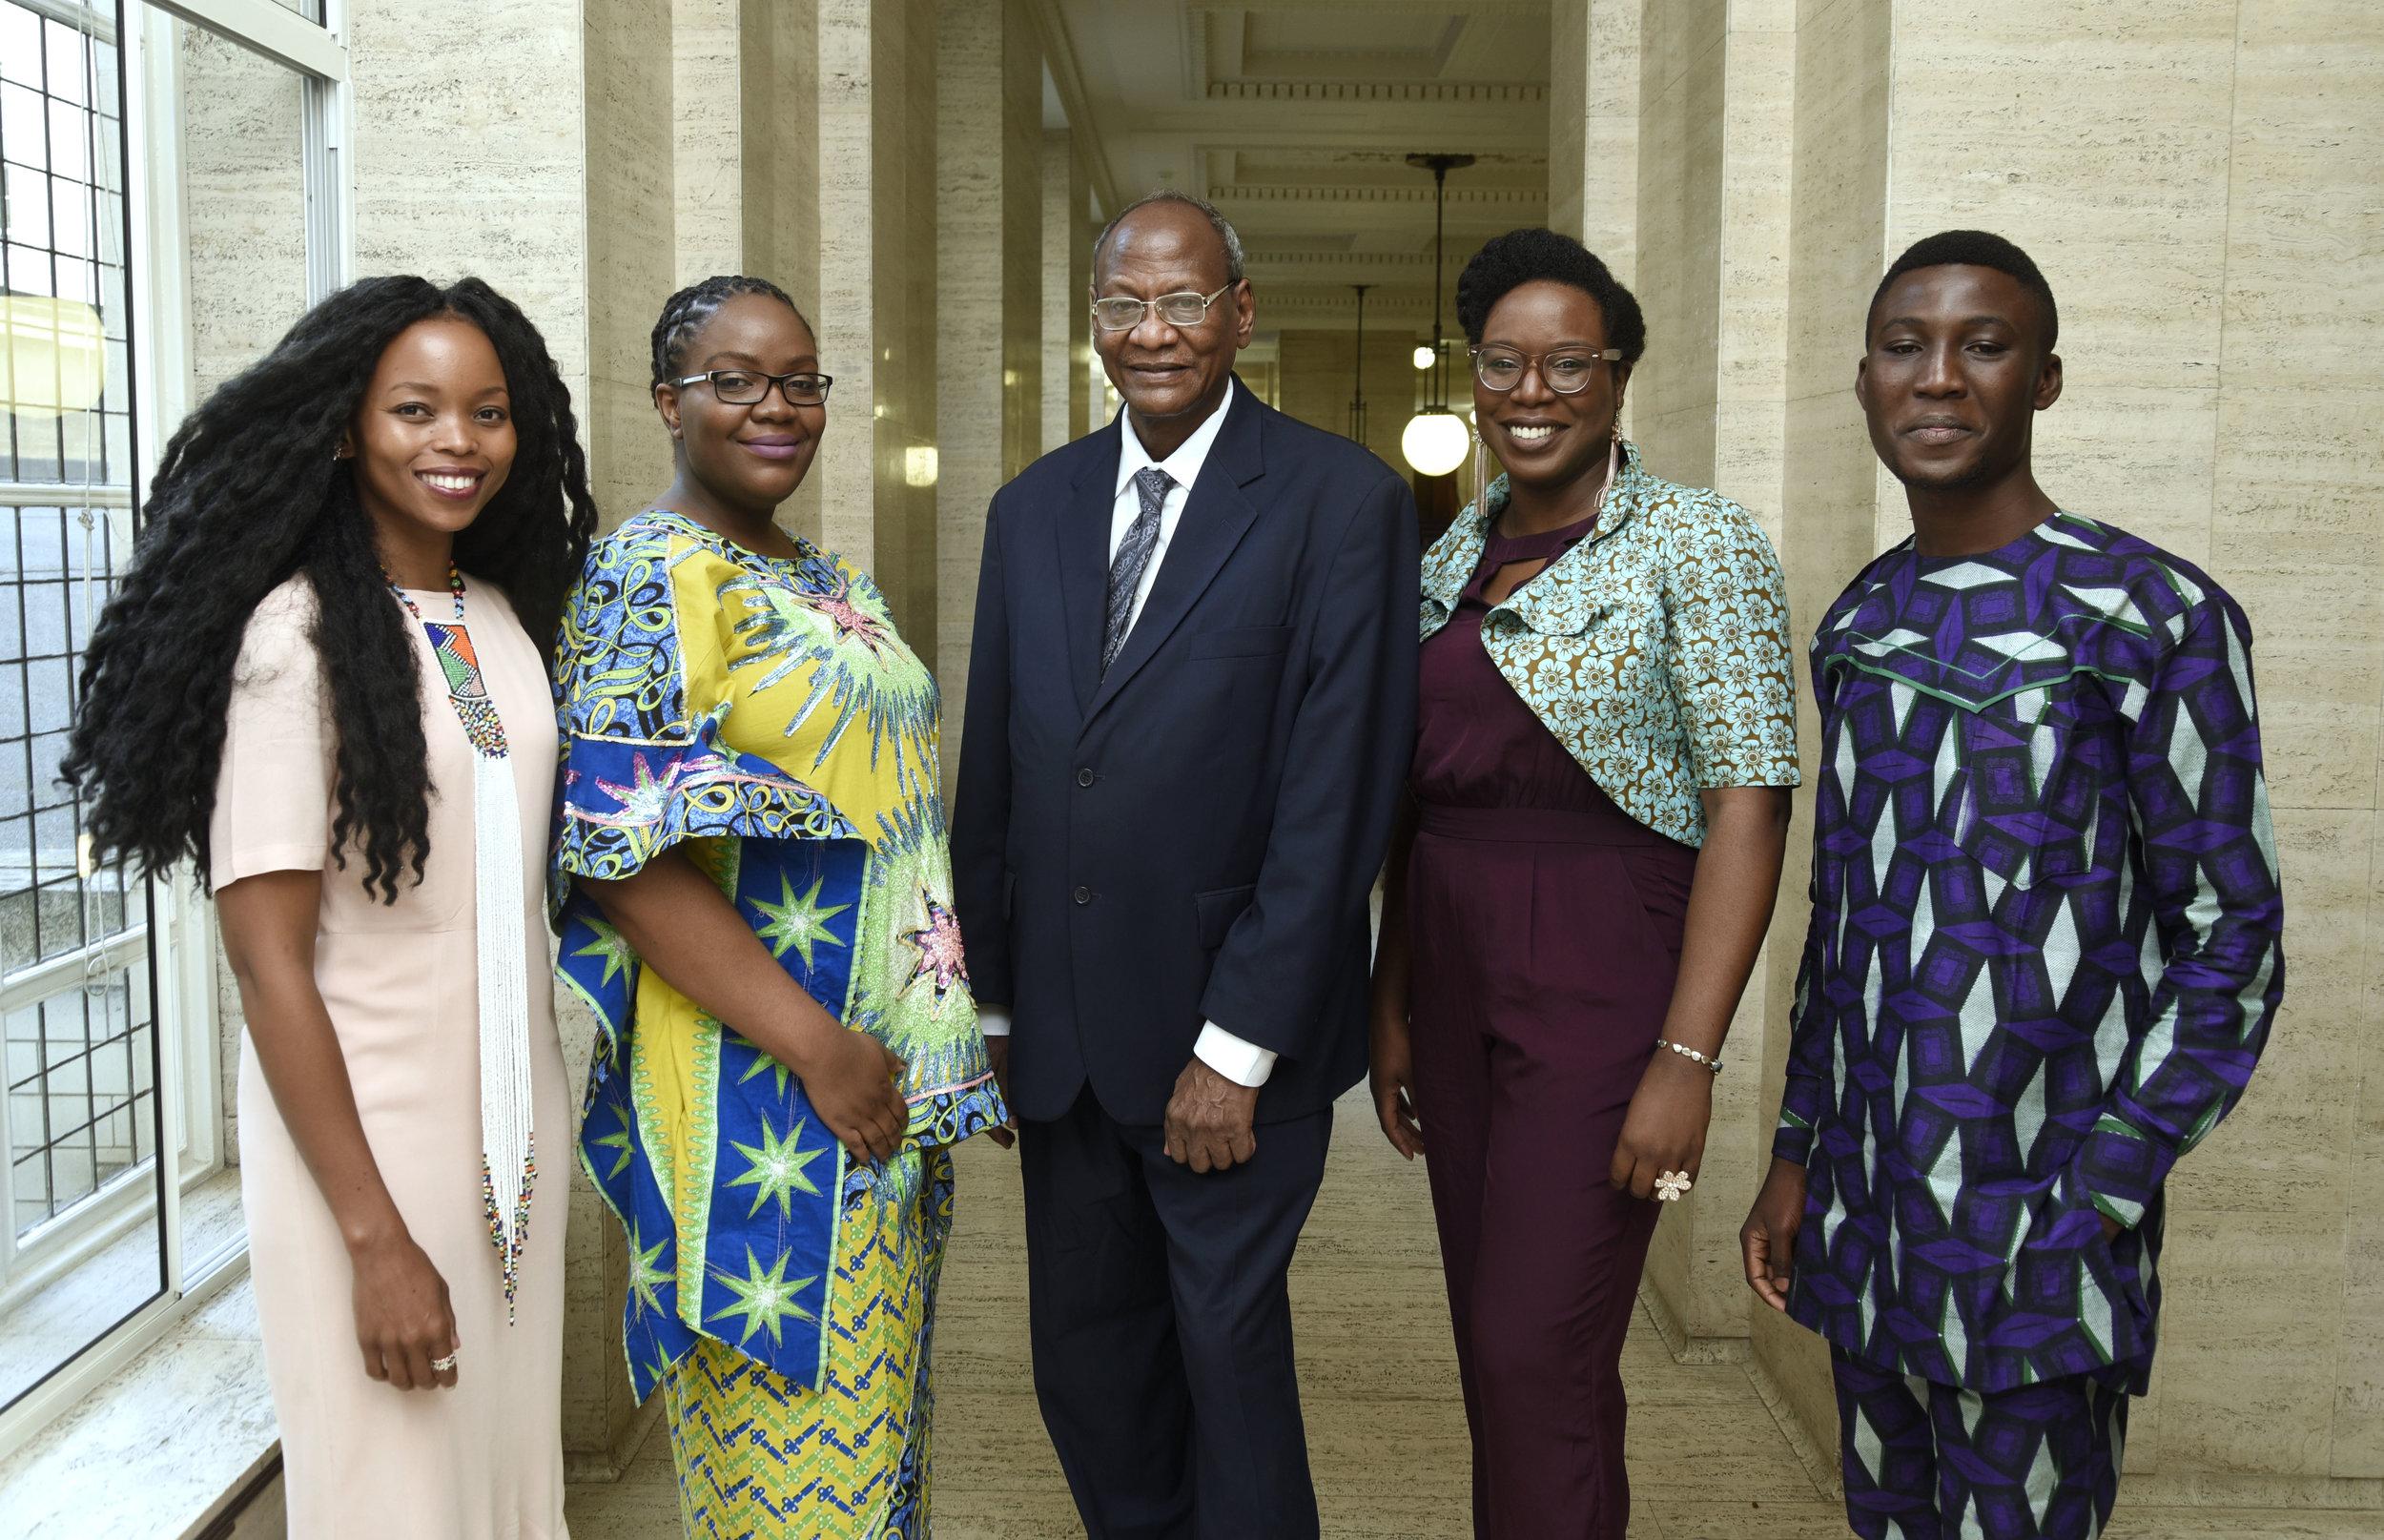 L-R: Magogodi oaMphela Makhene, Chikodili Emelumadu, Bushra al-Fadil, Lesley Nneka Arimah and Arinze Ifeakandu